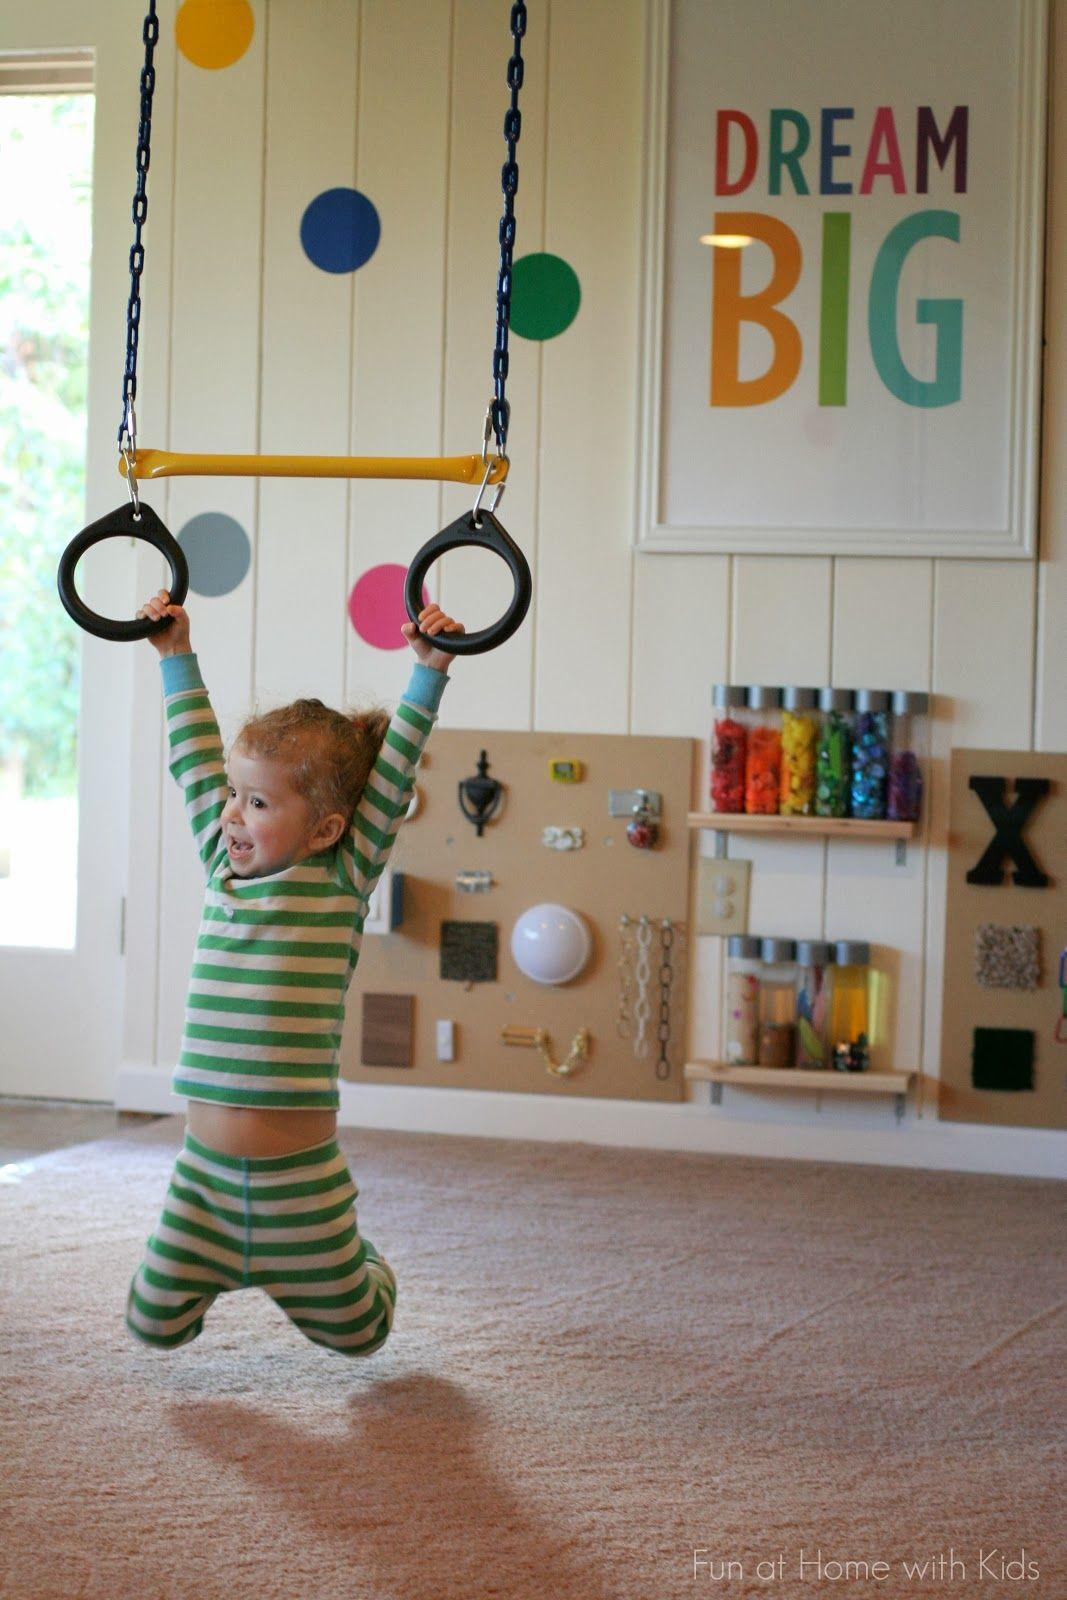 Playrooms For Toddlers Playroom Rulesplayroom Artkids Room Artcustom Playroom Sign